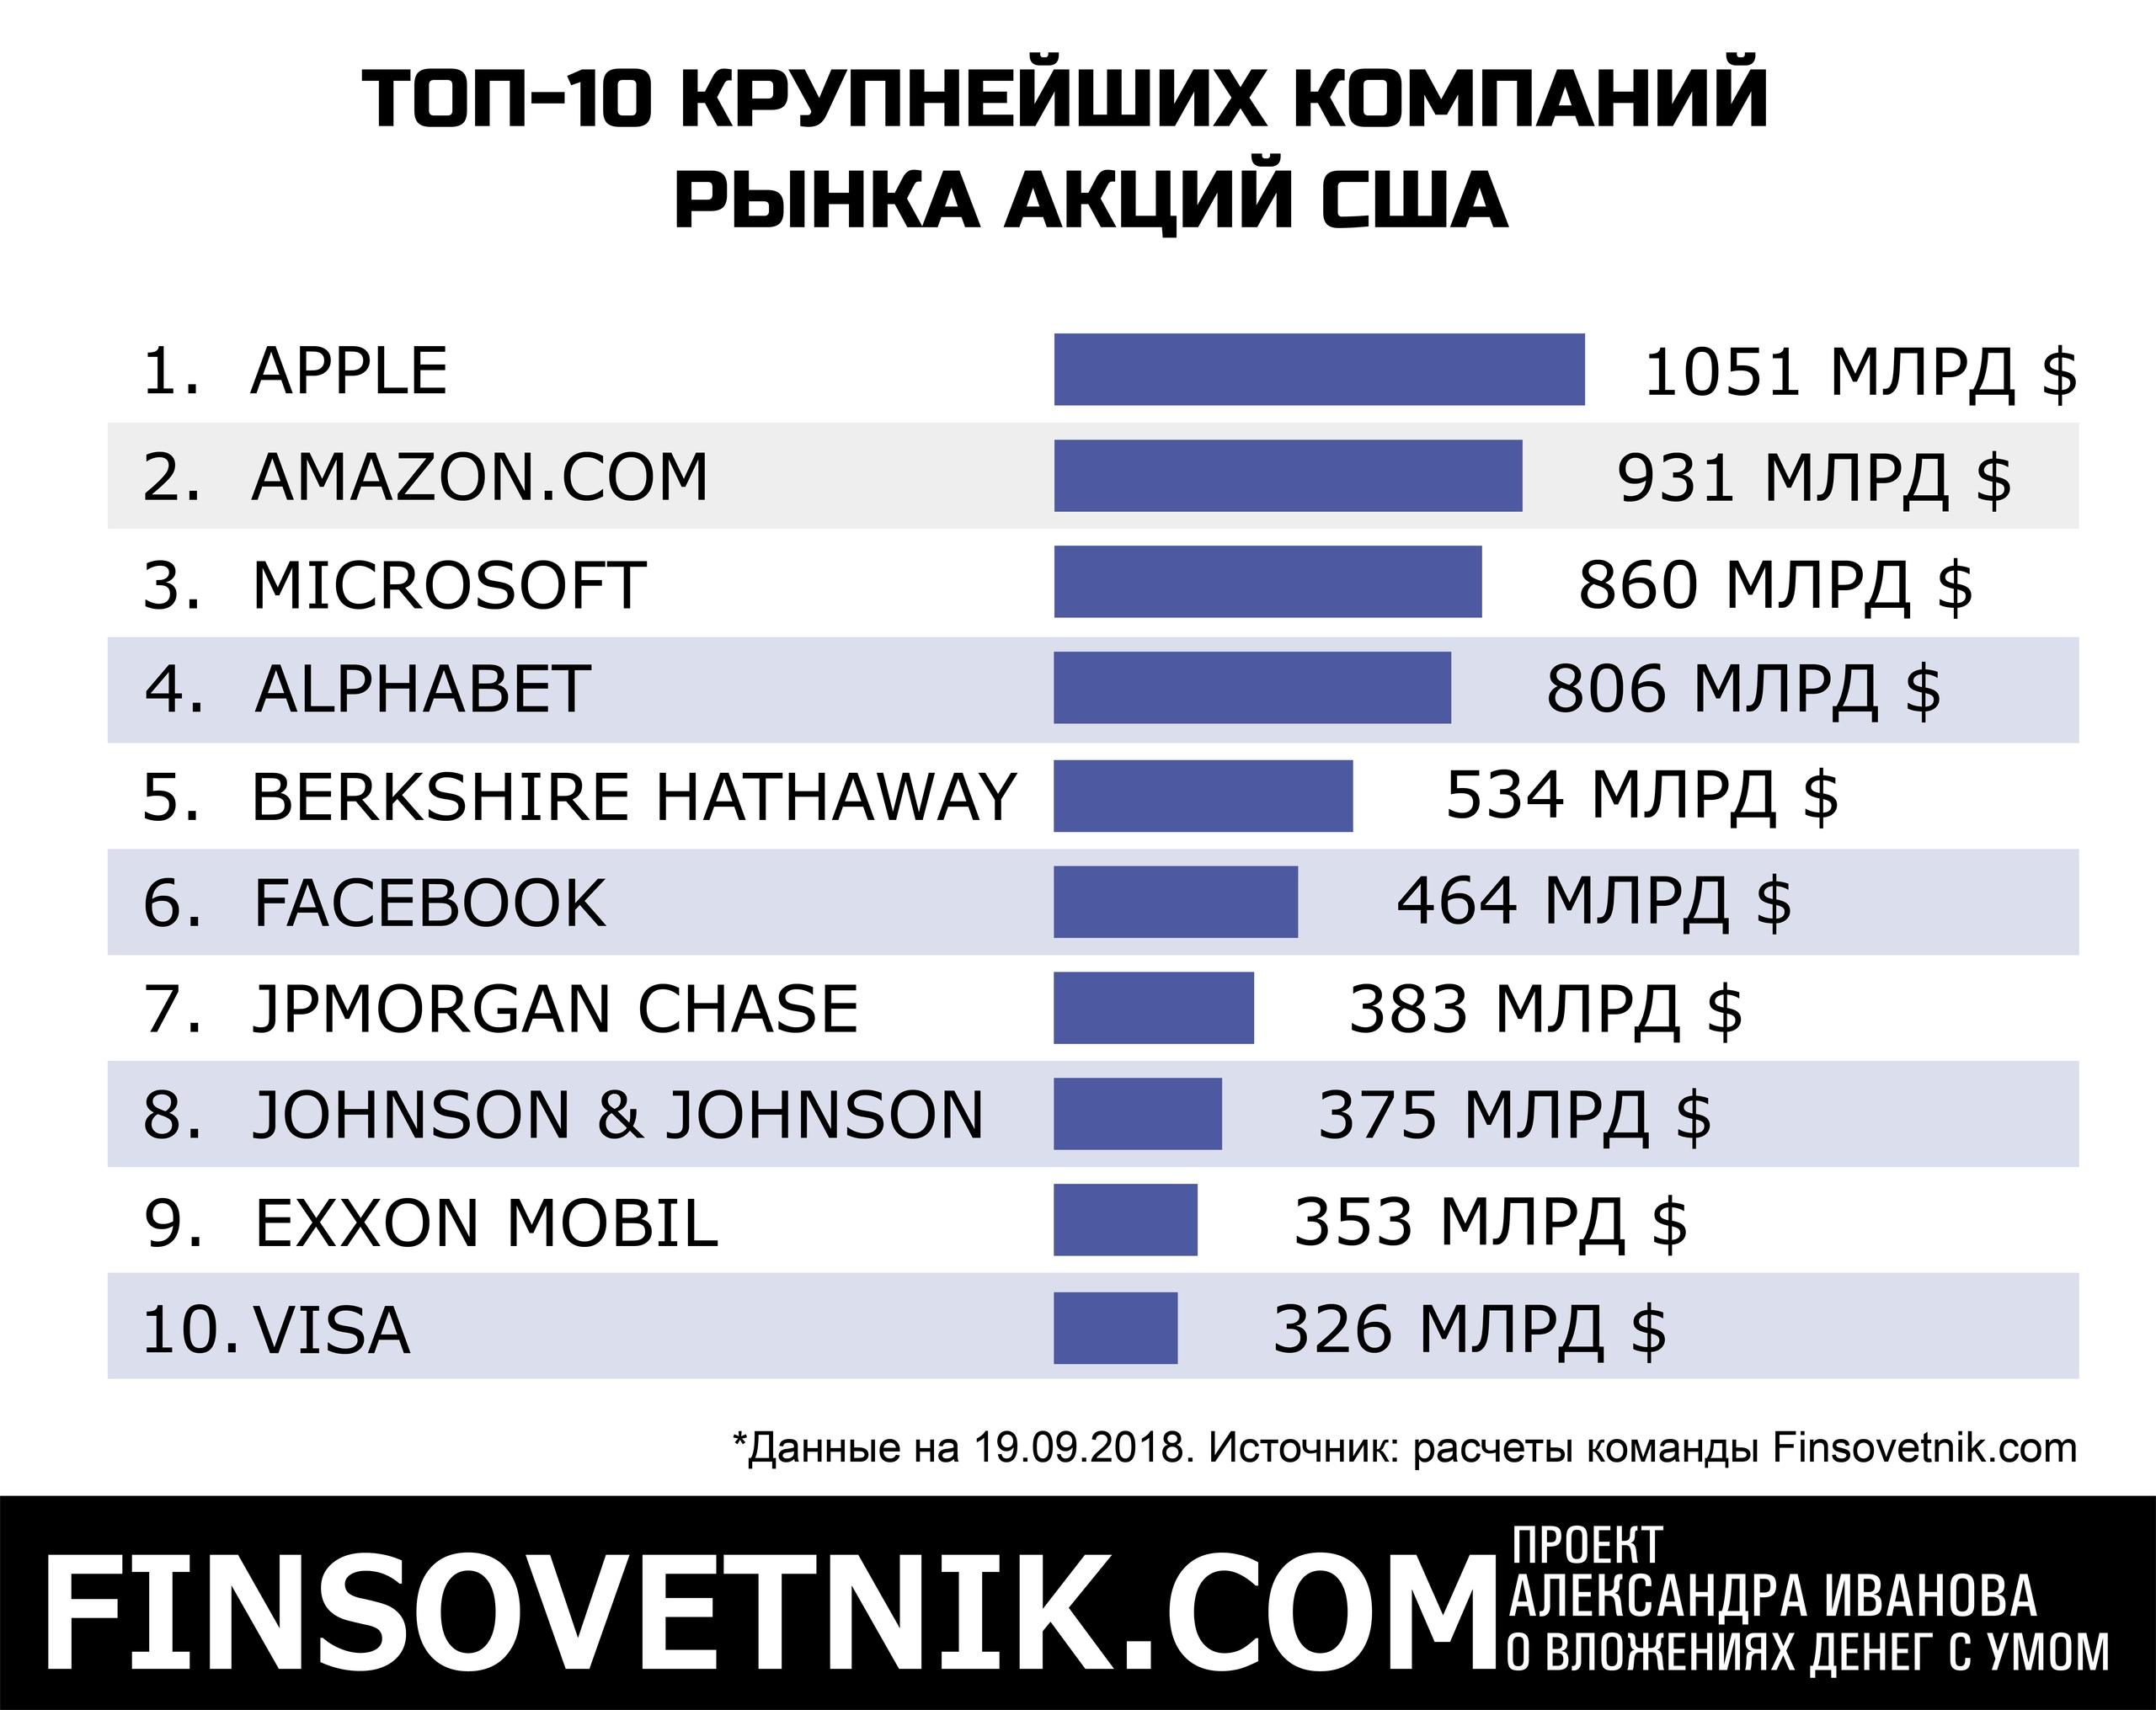 Фото акций российских компаний